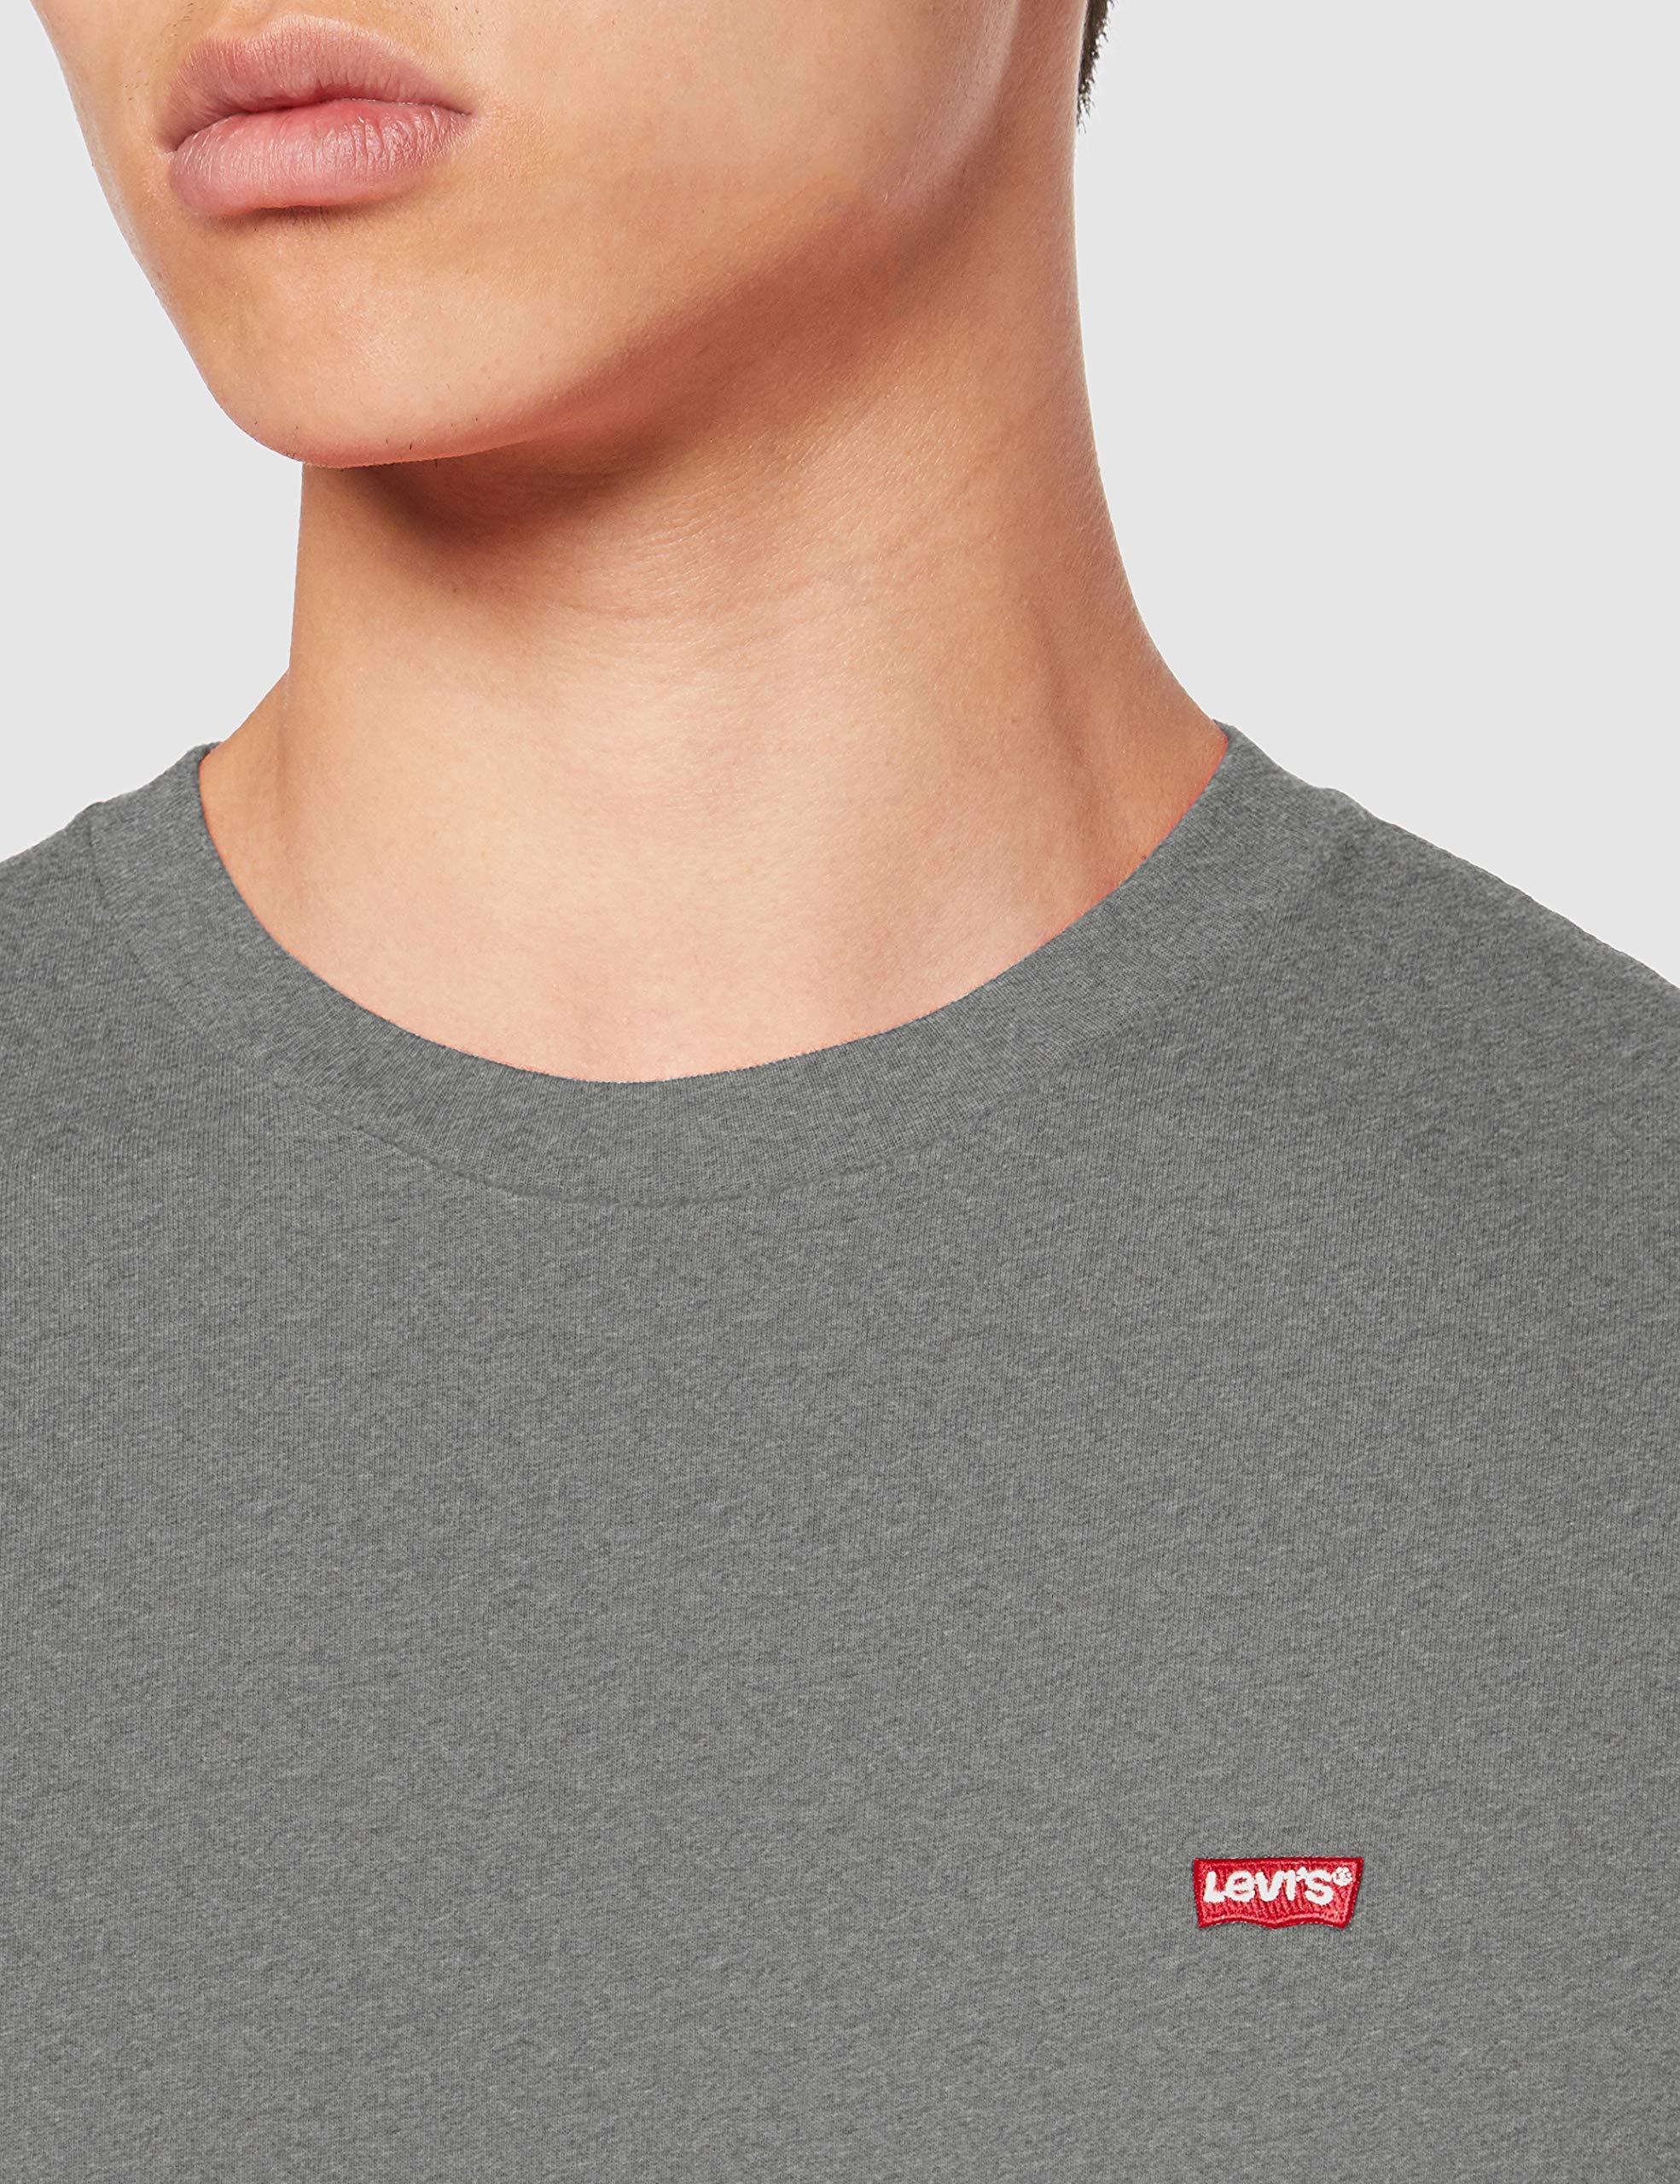 Levi's SS Original HM Tee T-Shirt Uomo 4 spesavip